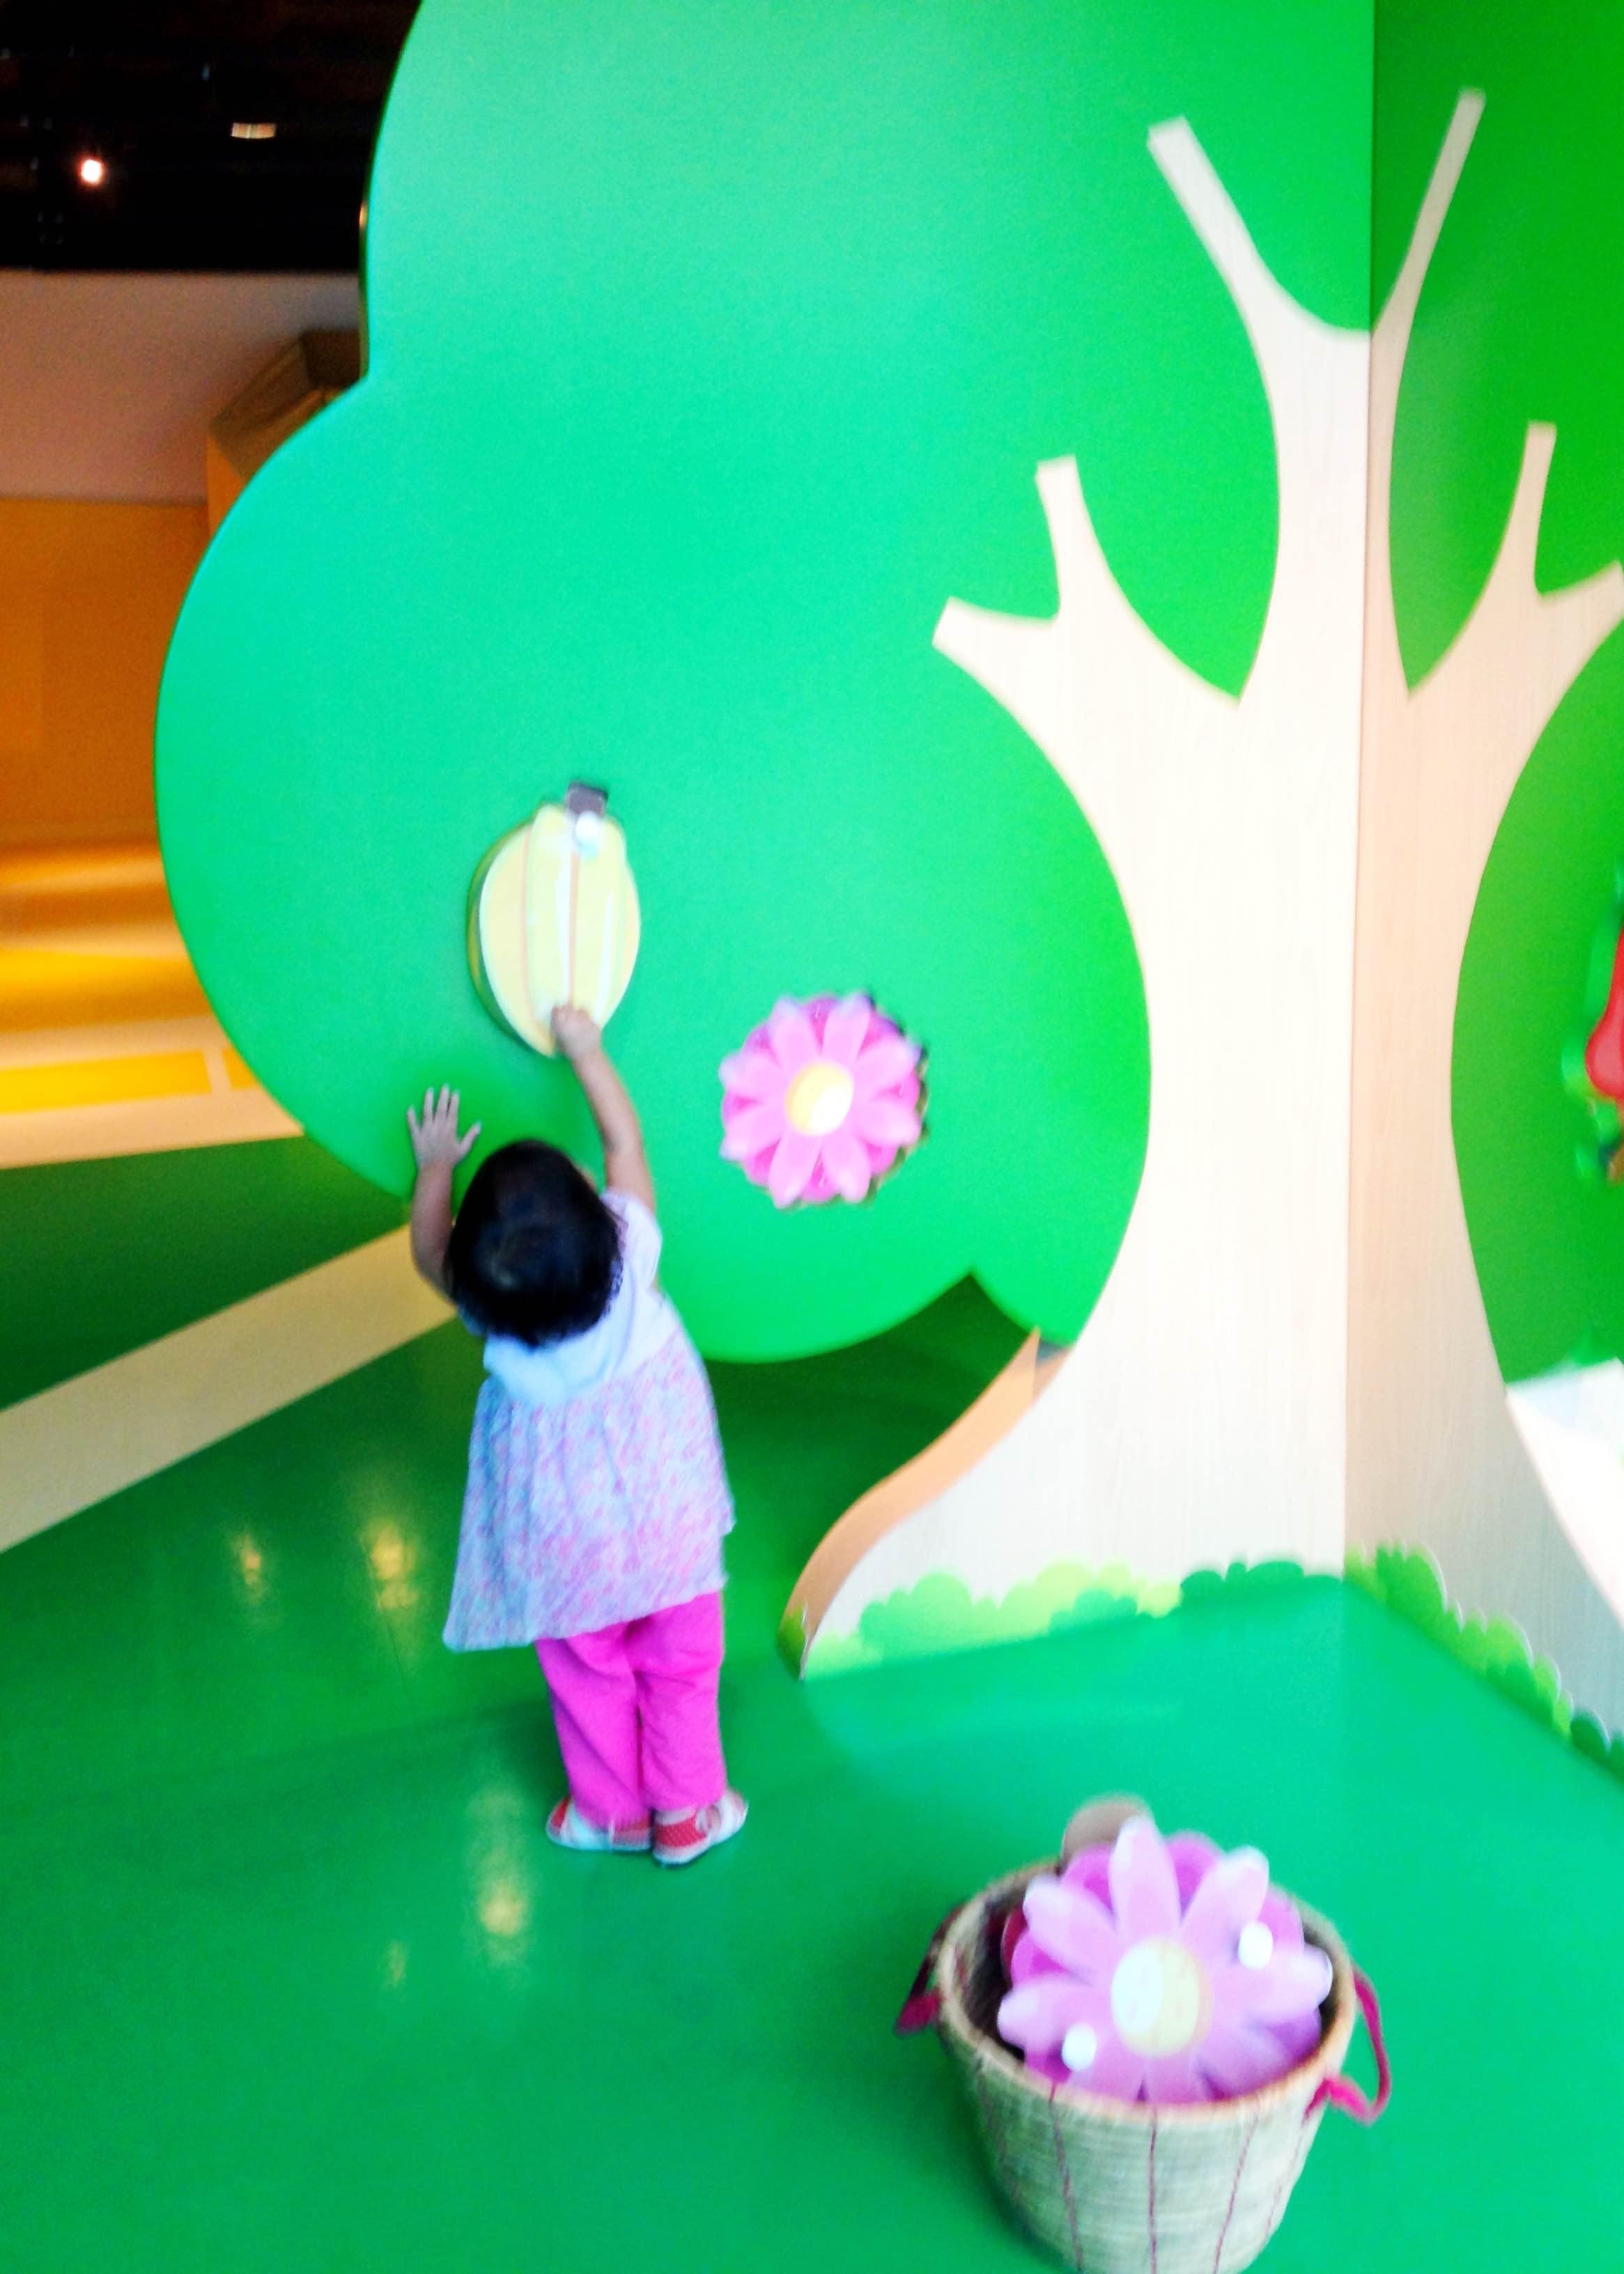 play-national-museum-singapore